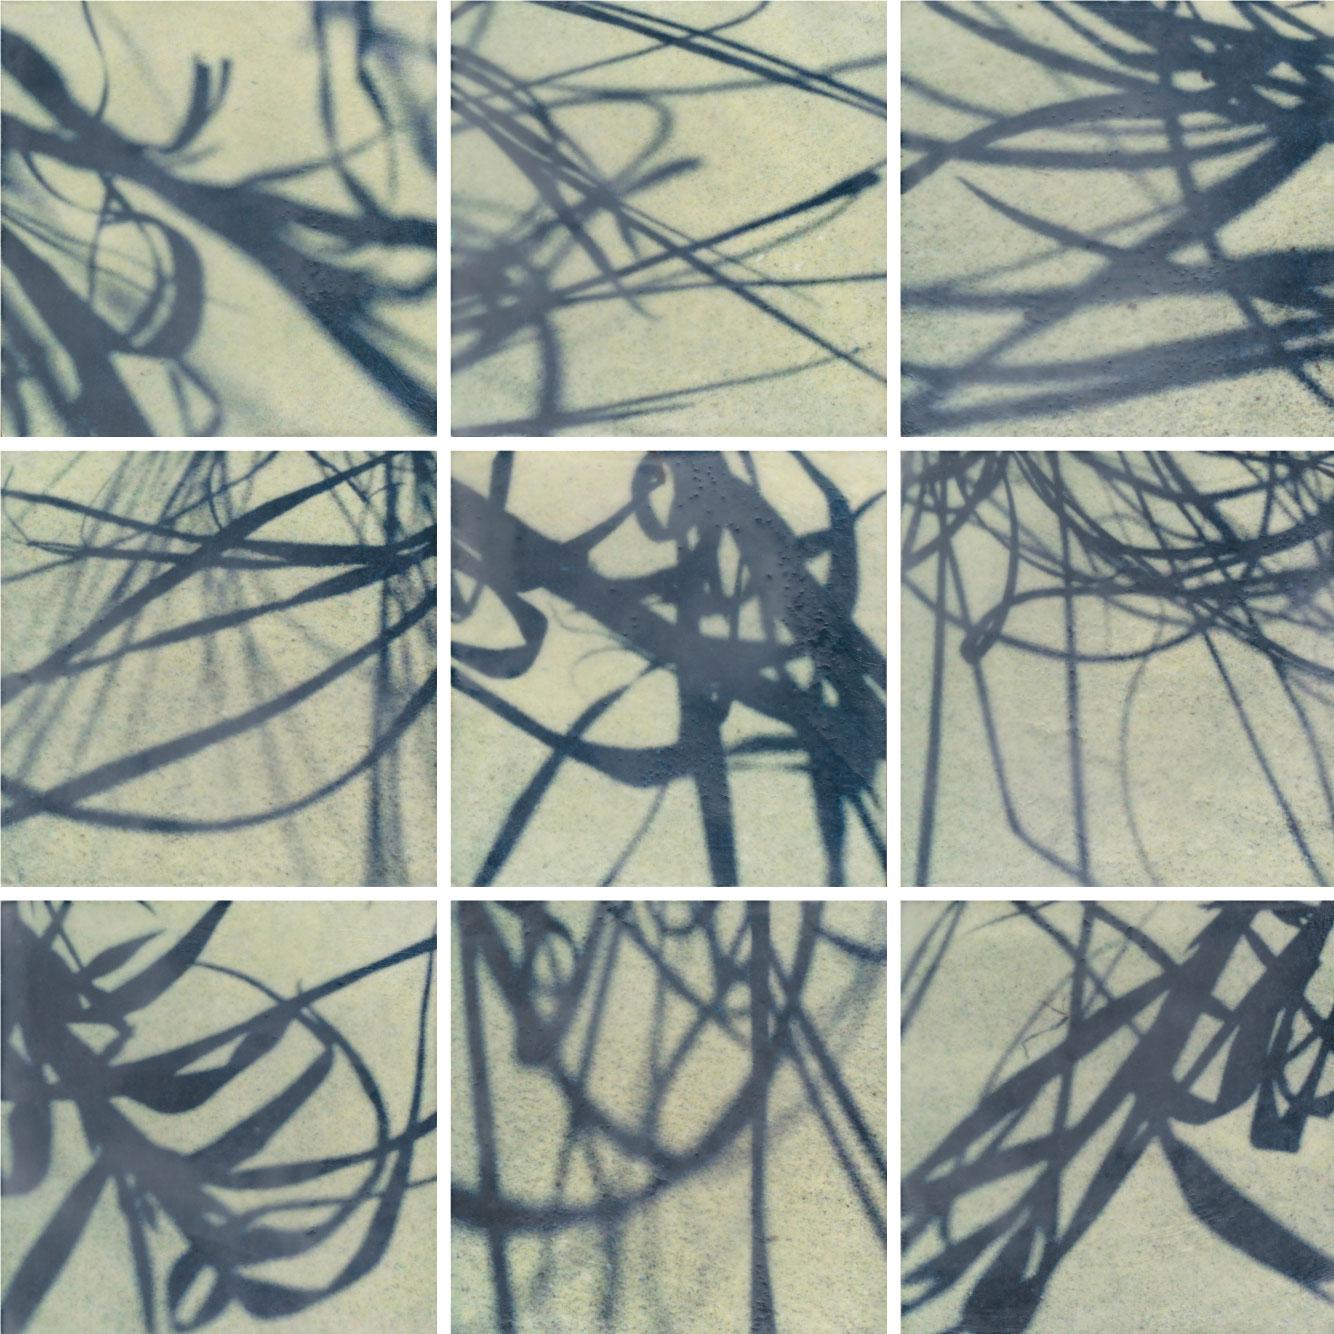 Erin-Keane_Shadow-Calligraphy.jpg